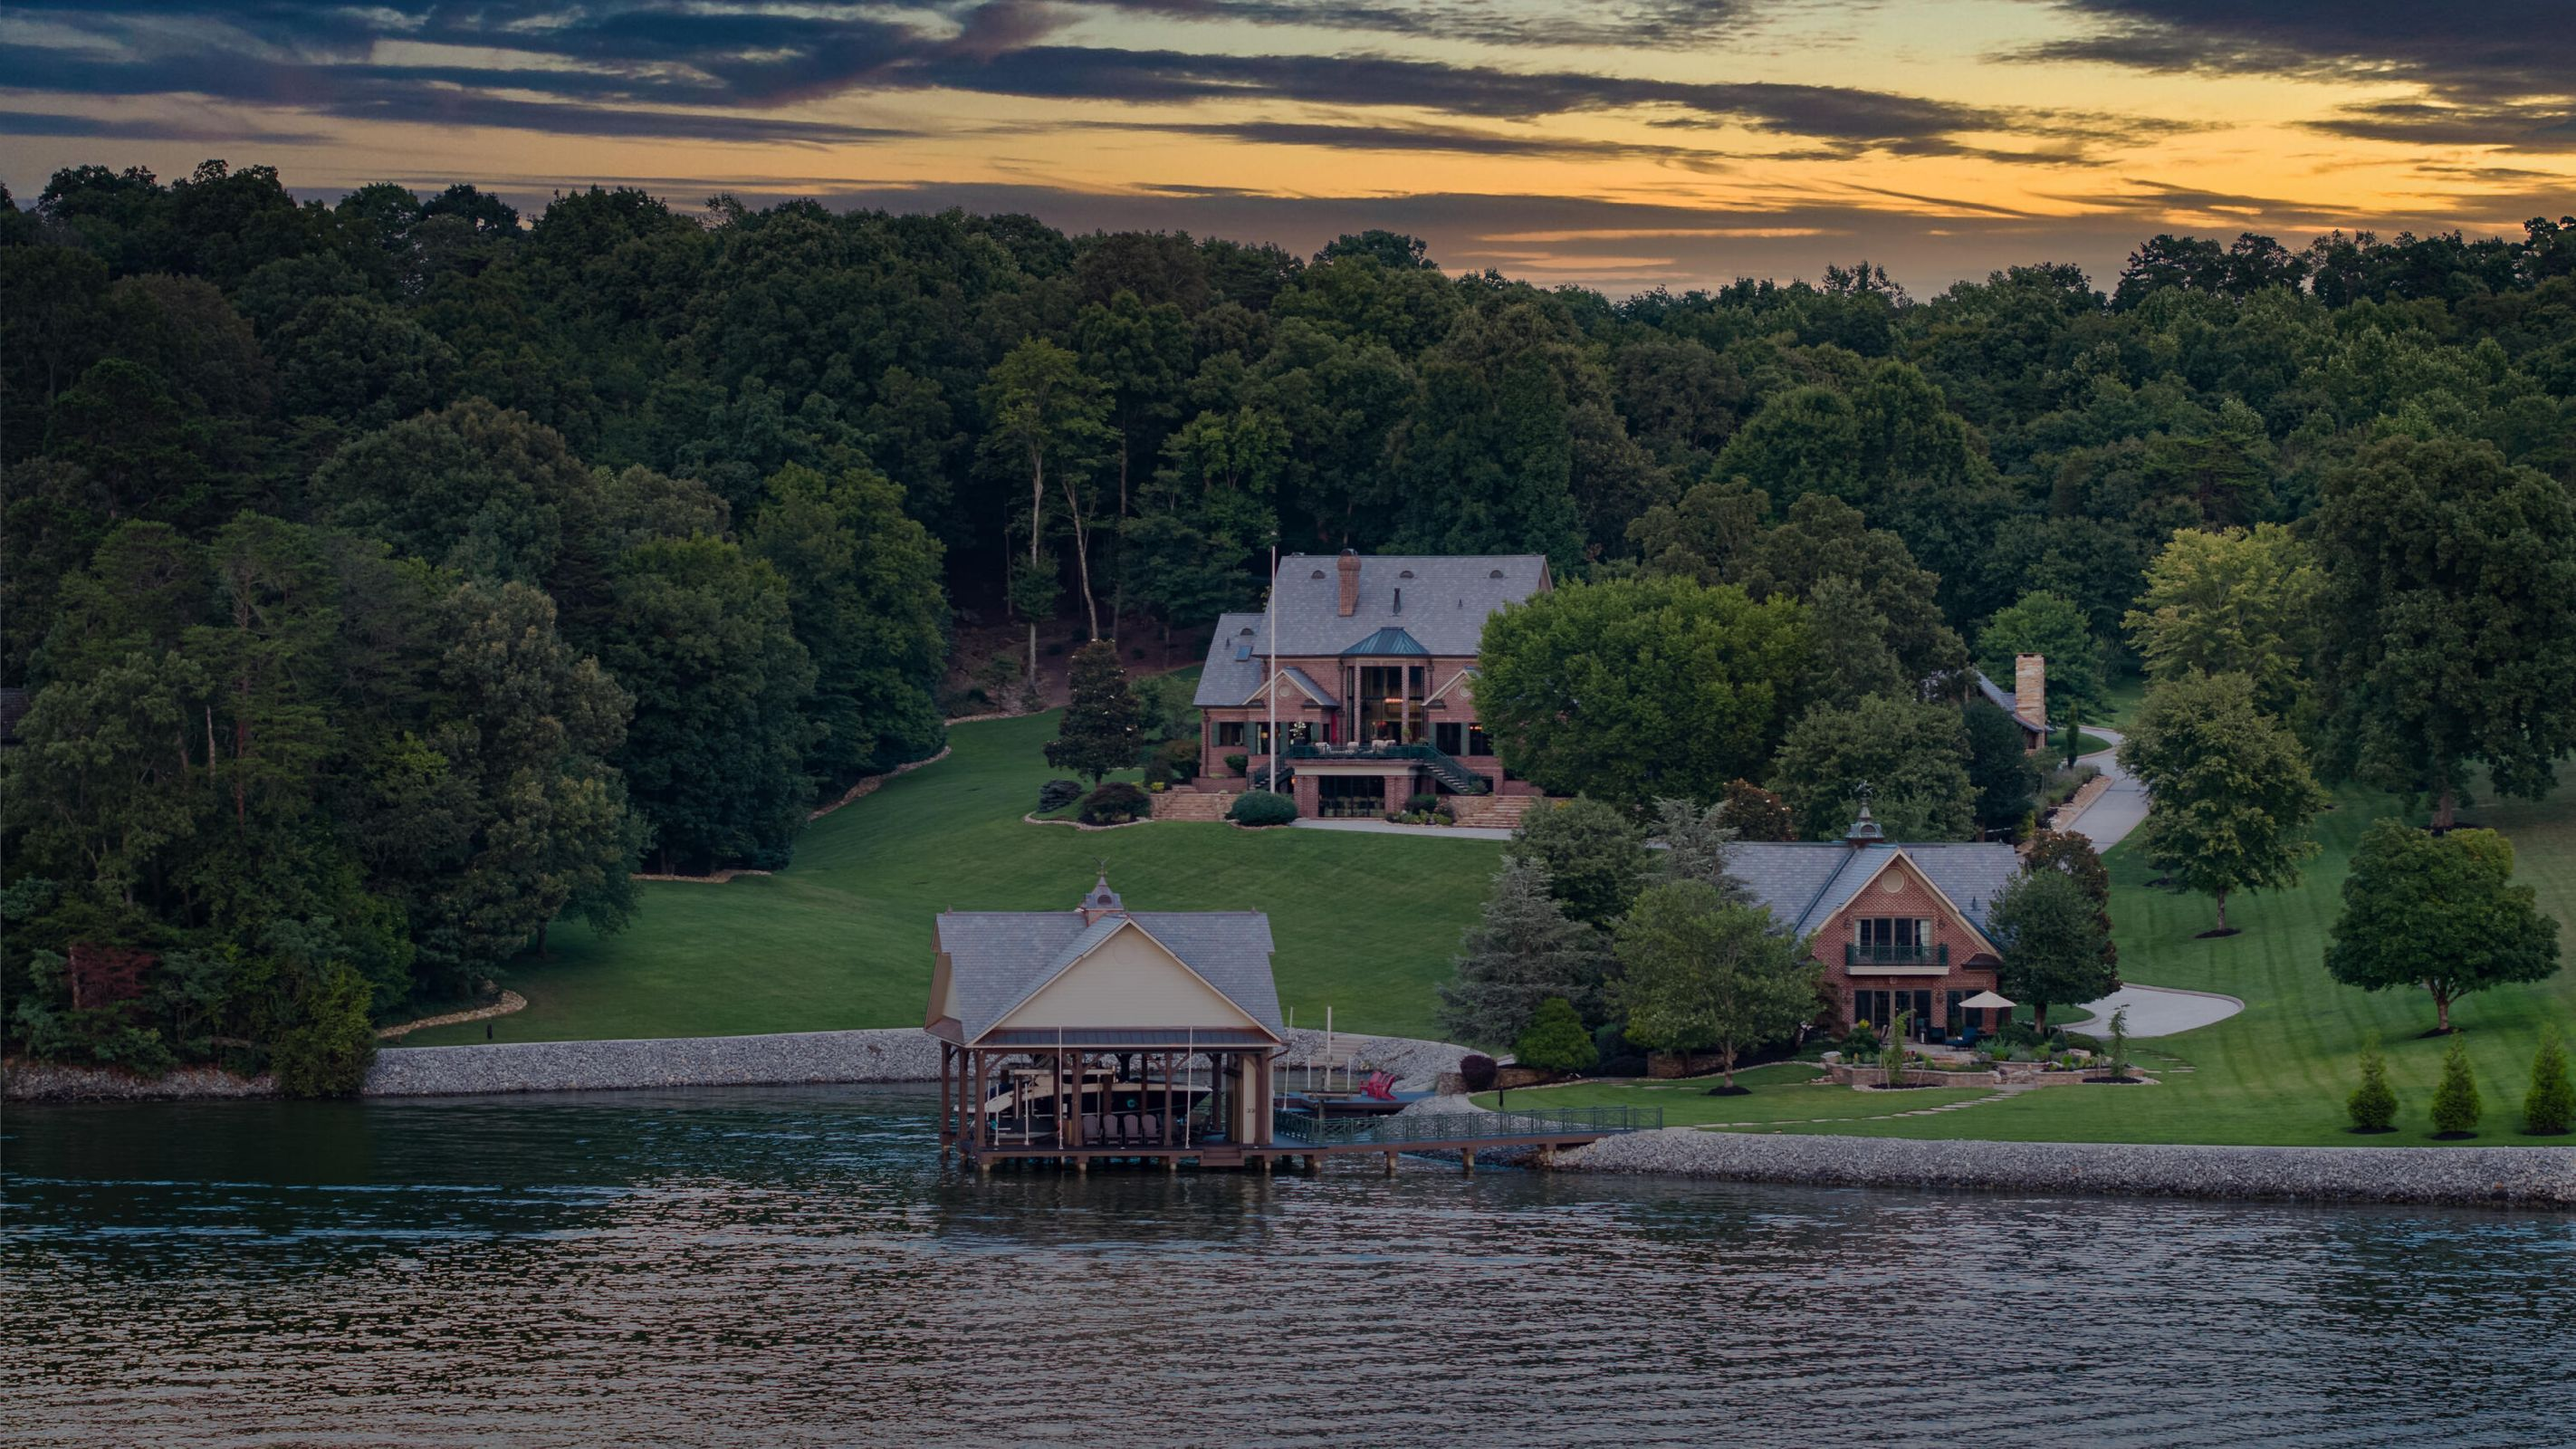 LakeMeadowWay_Aug2021-3